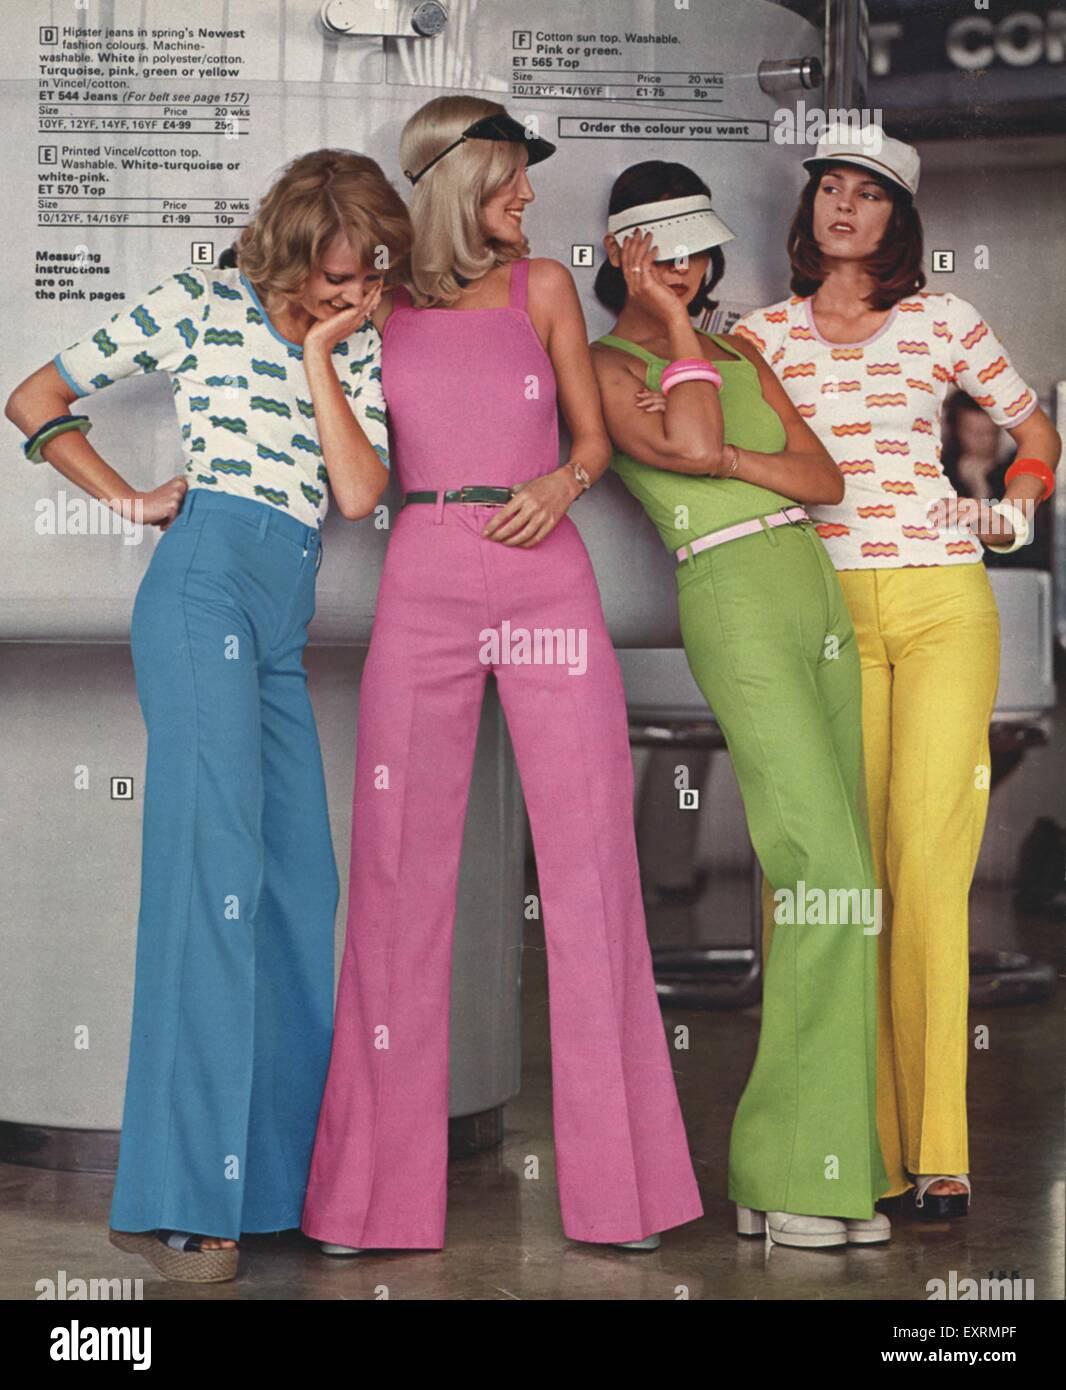 1f6b24cdc3 1970s UK Womens Fashion Catalogue/ Brochure Plate Stock Photo ...